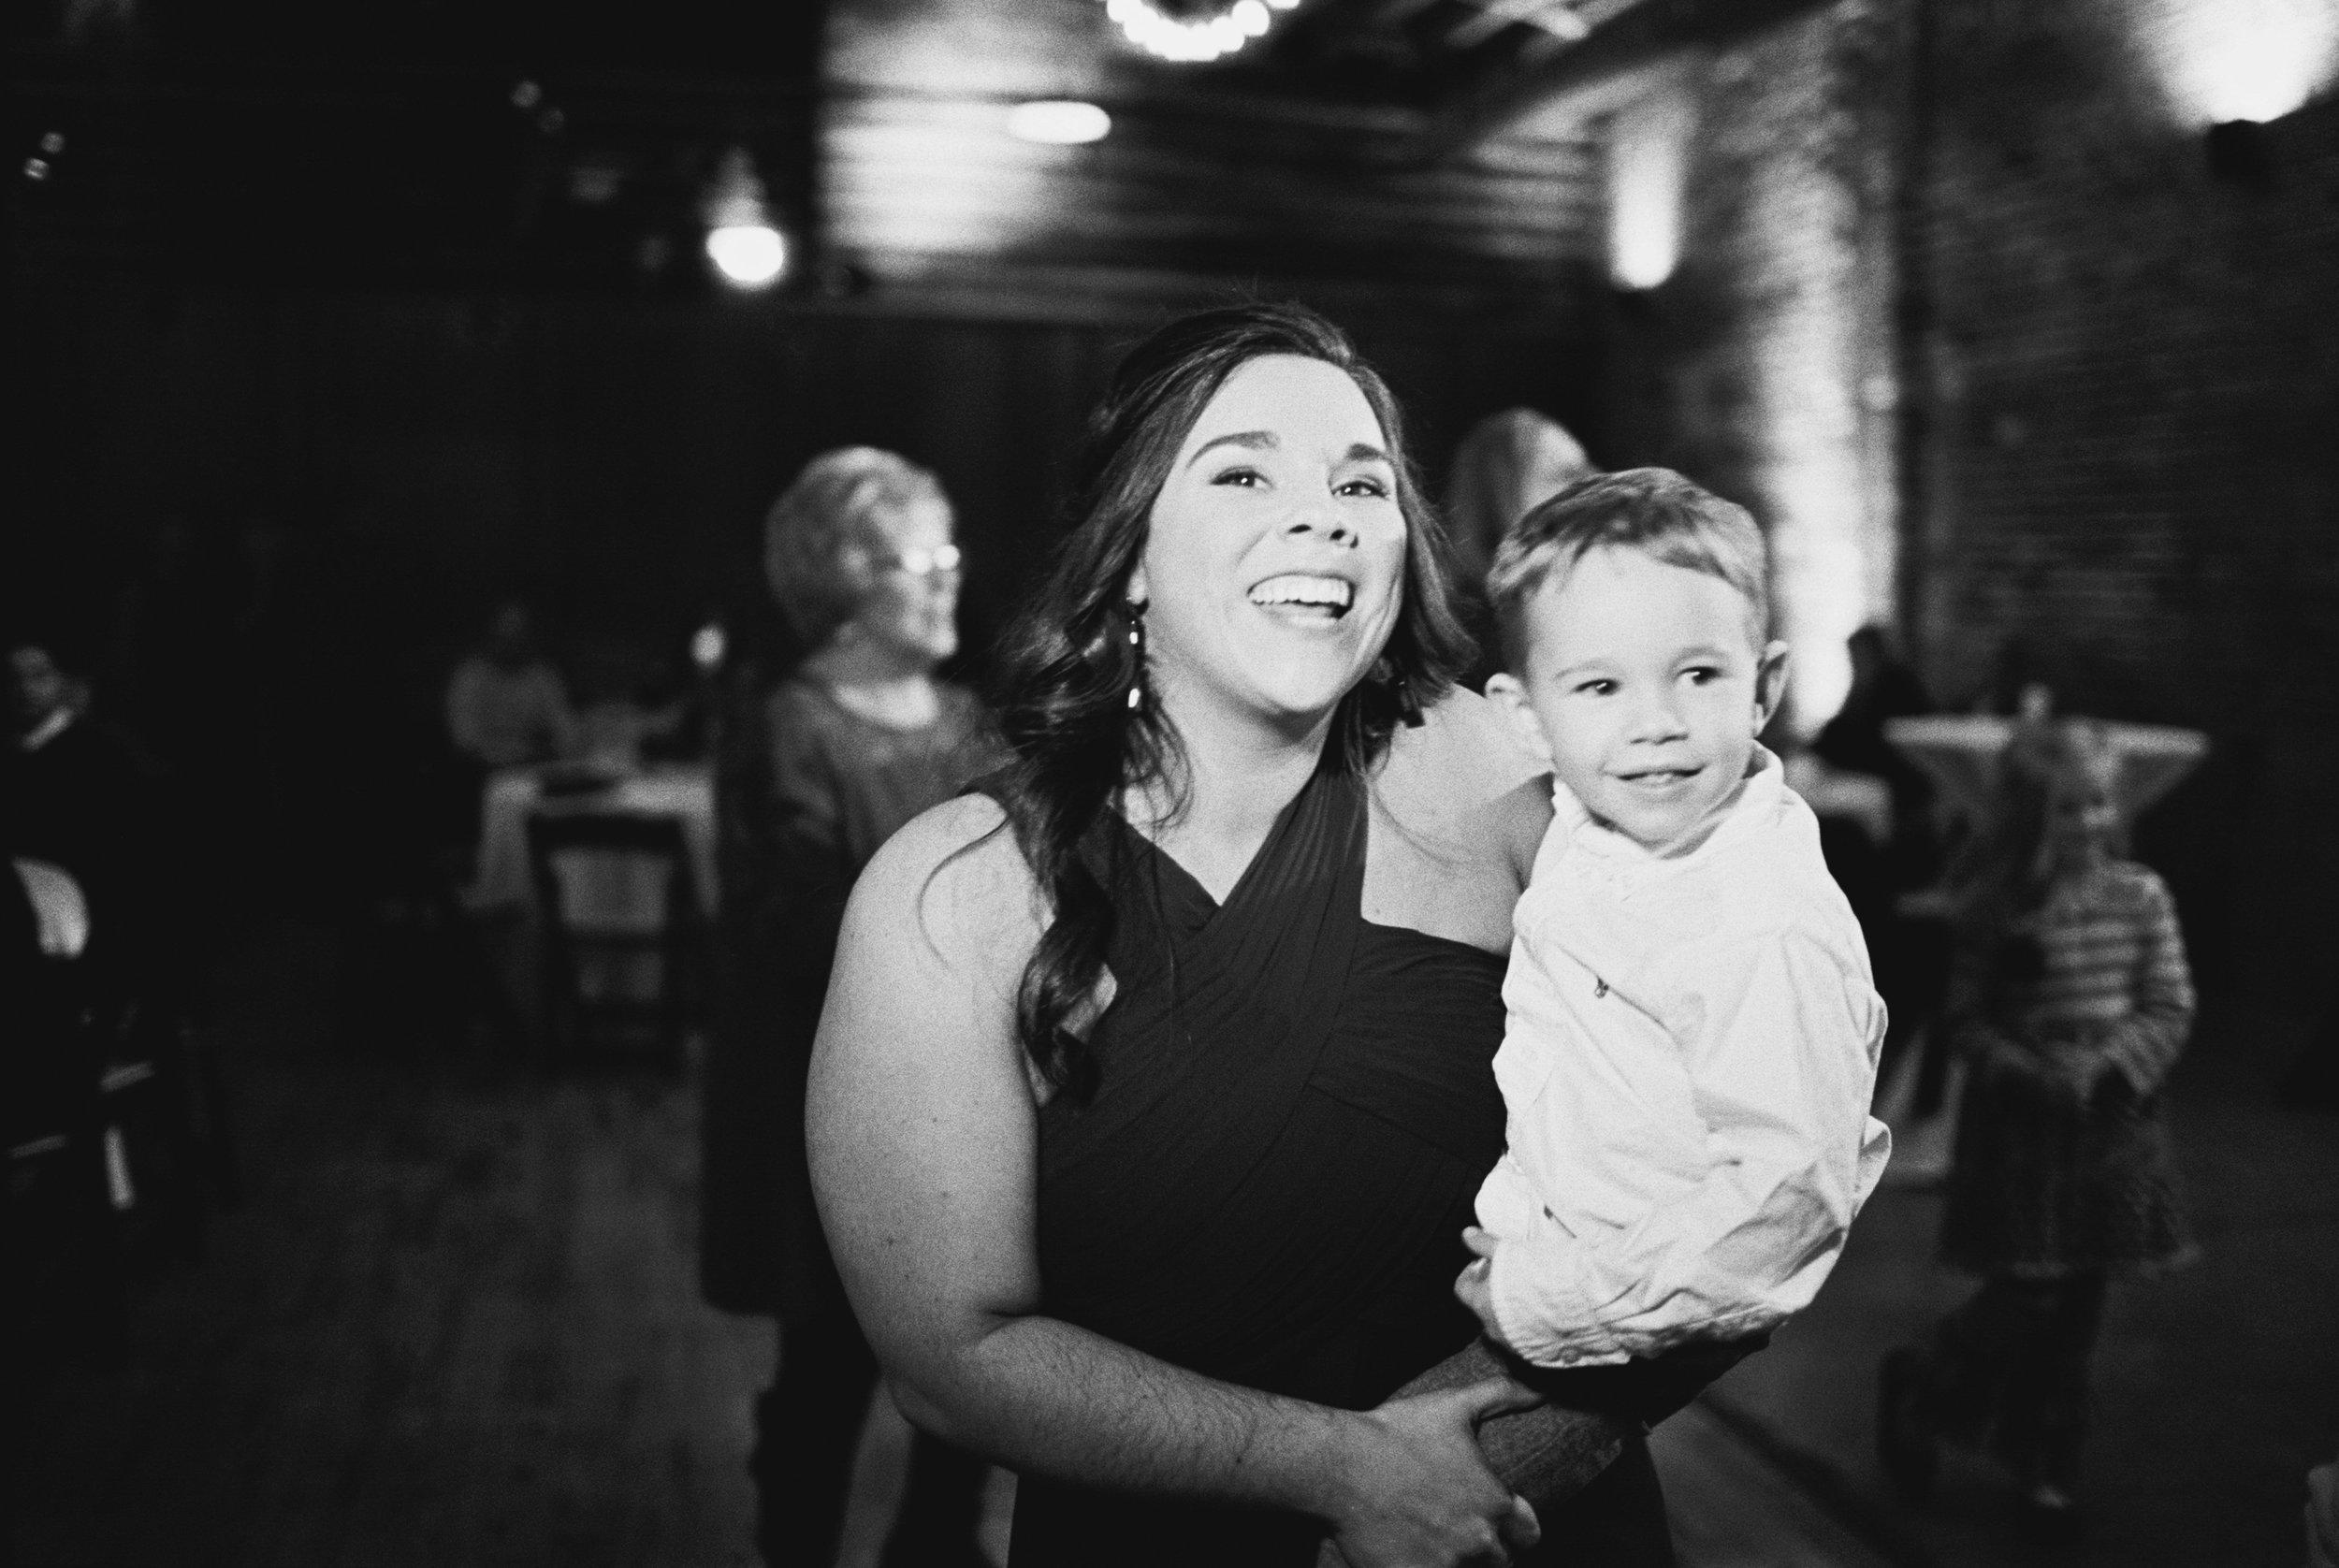 Lauren_Jeremy_Standard_Wedding_Knoxville_Abigail_Malone_Photography_FIlm-585.jpg